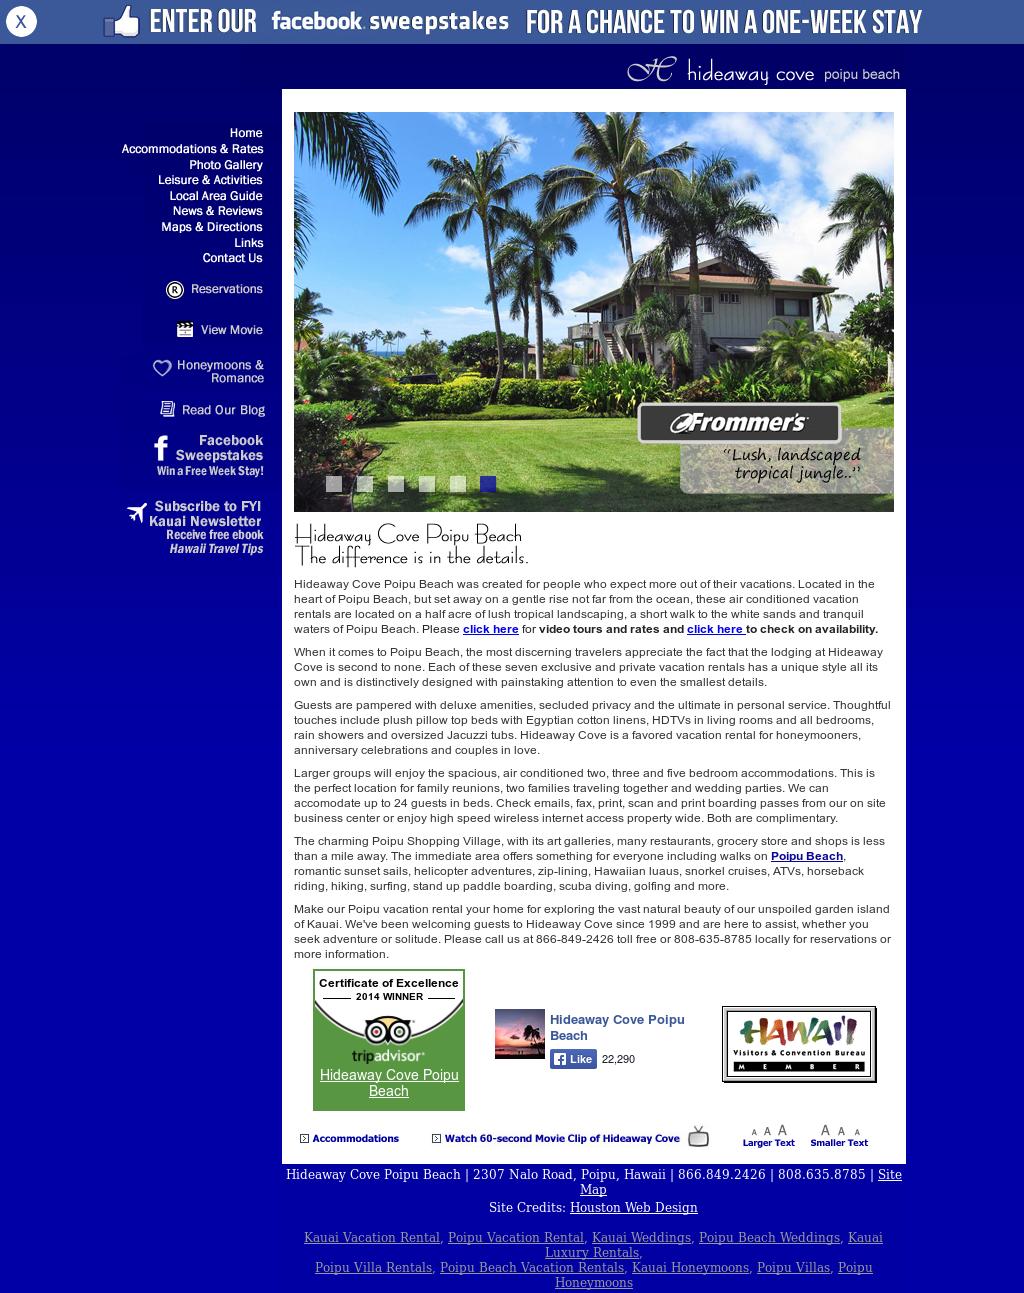 Hideaway Cove Poipu Beach Competitors, Revenue and Employees